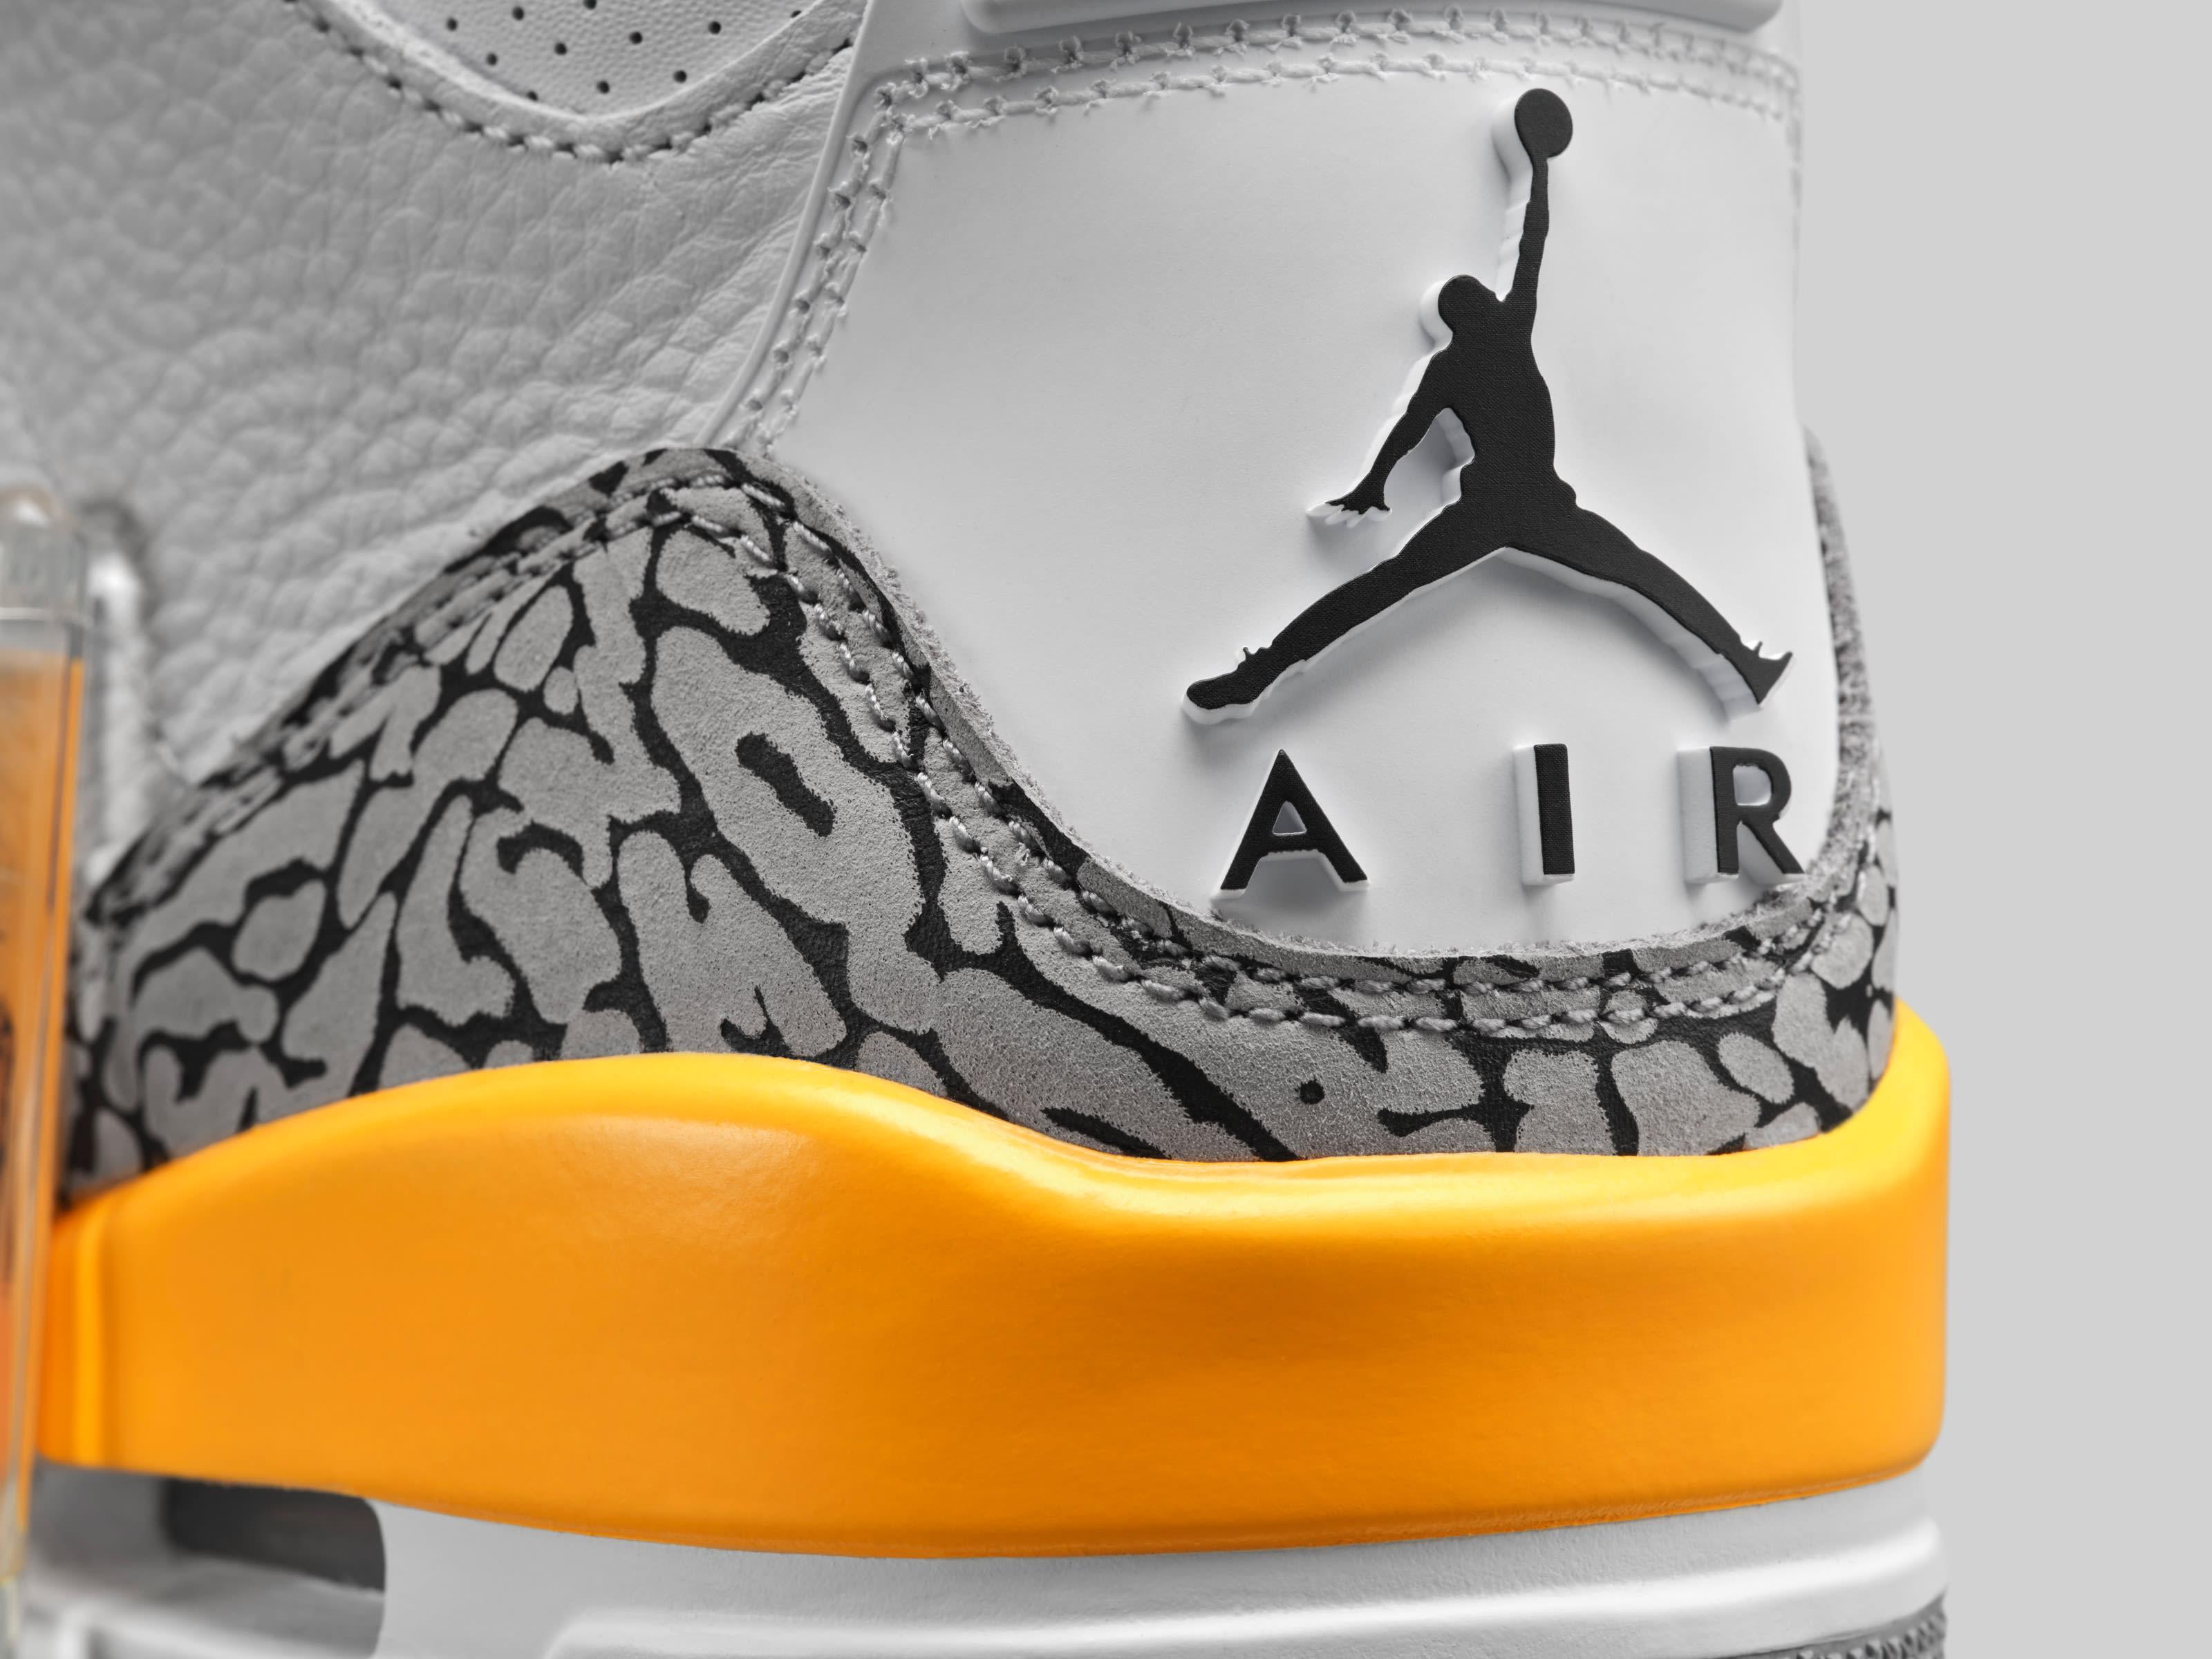 Air Jordan 3 Retro Women's 'Laser Orange' CK9246-108 Heel